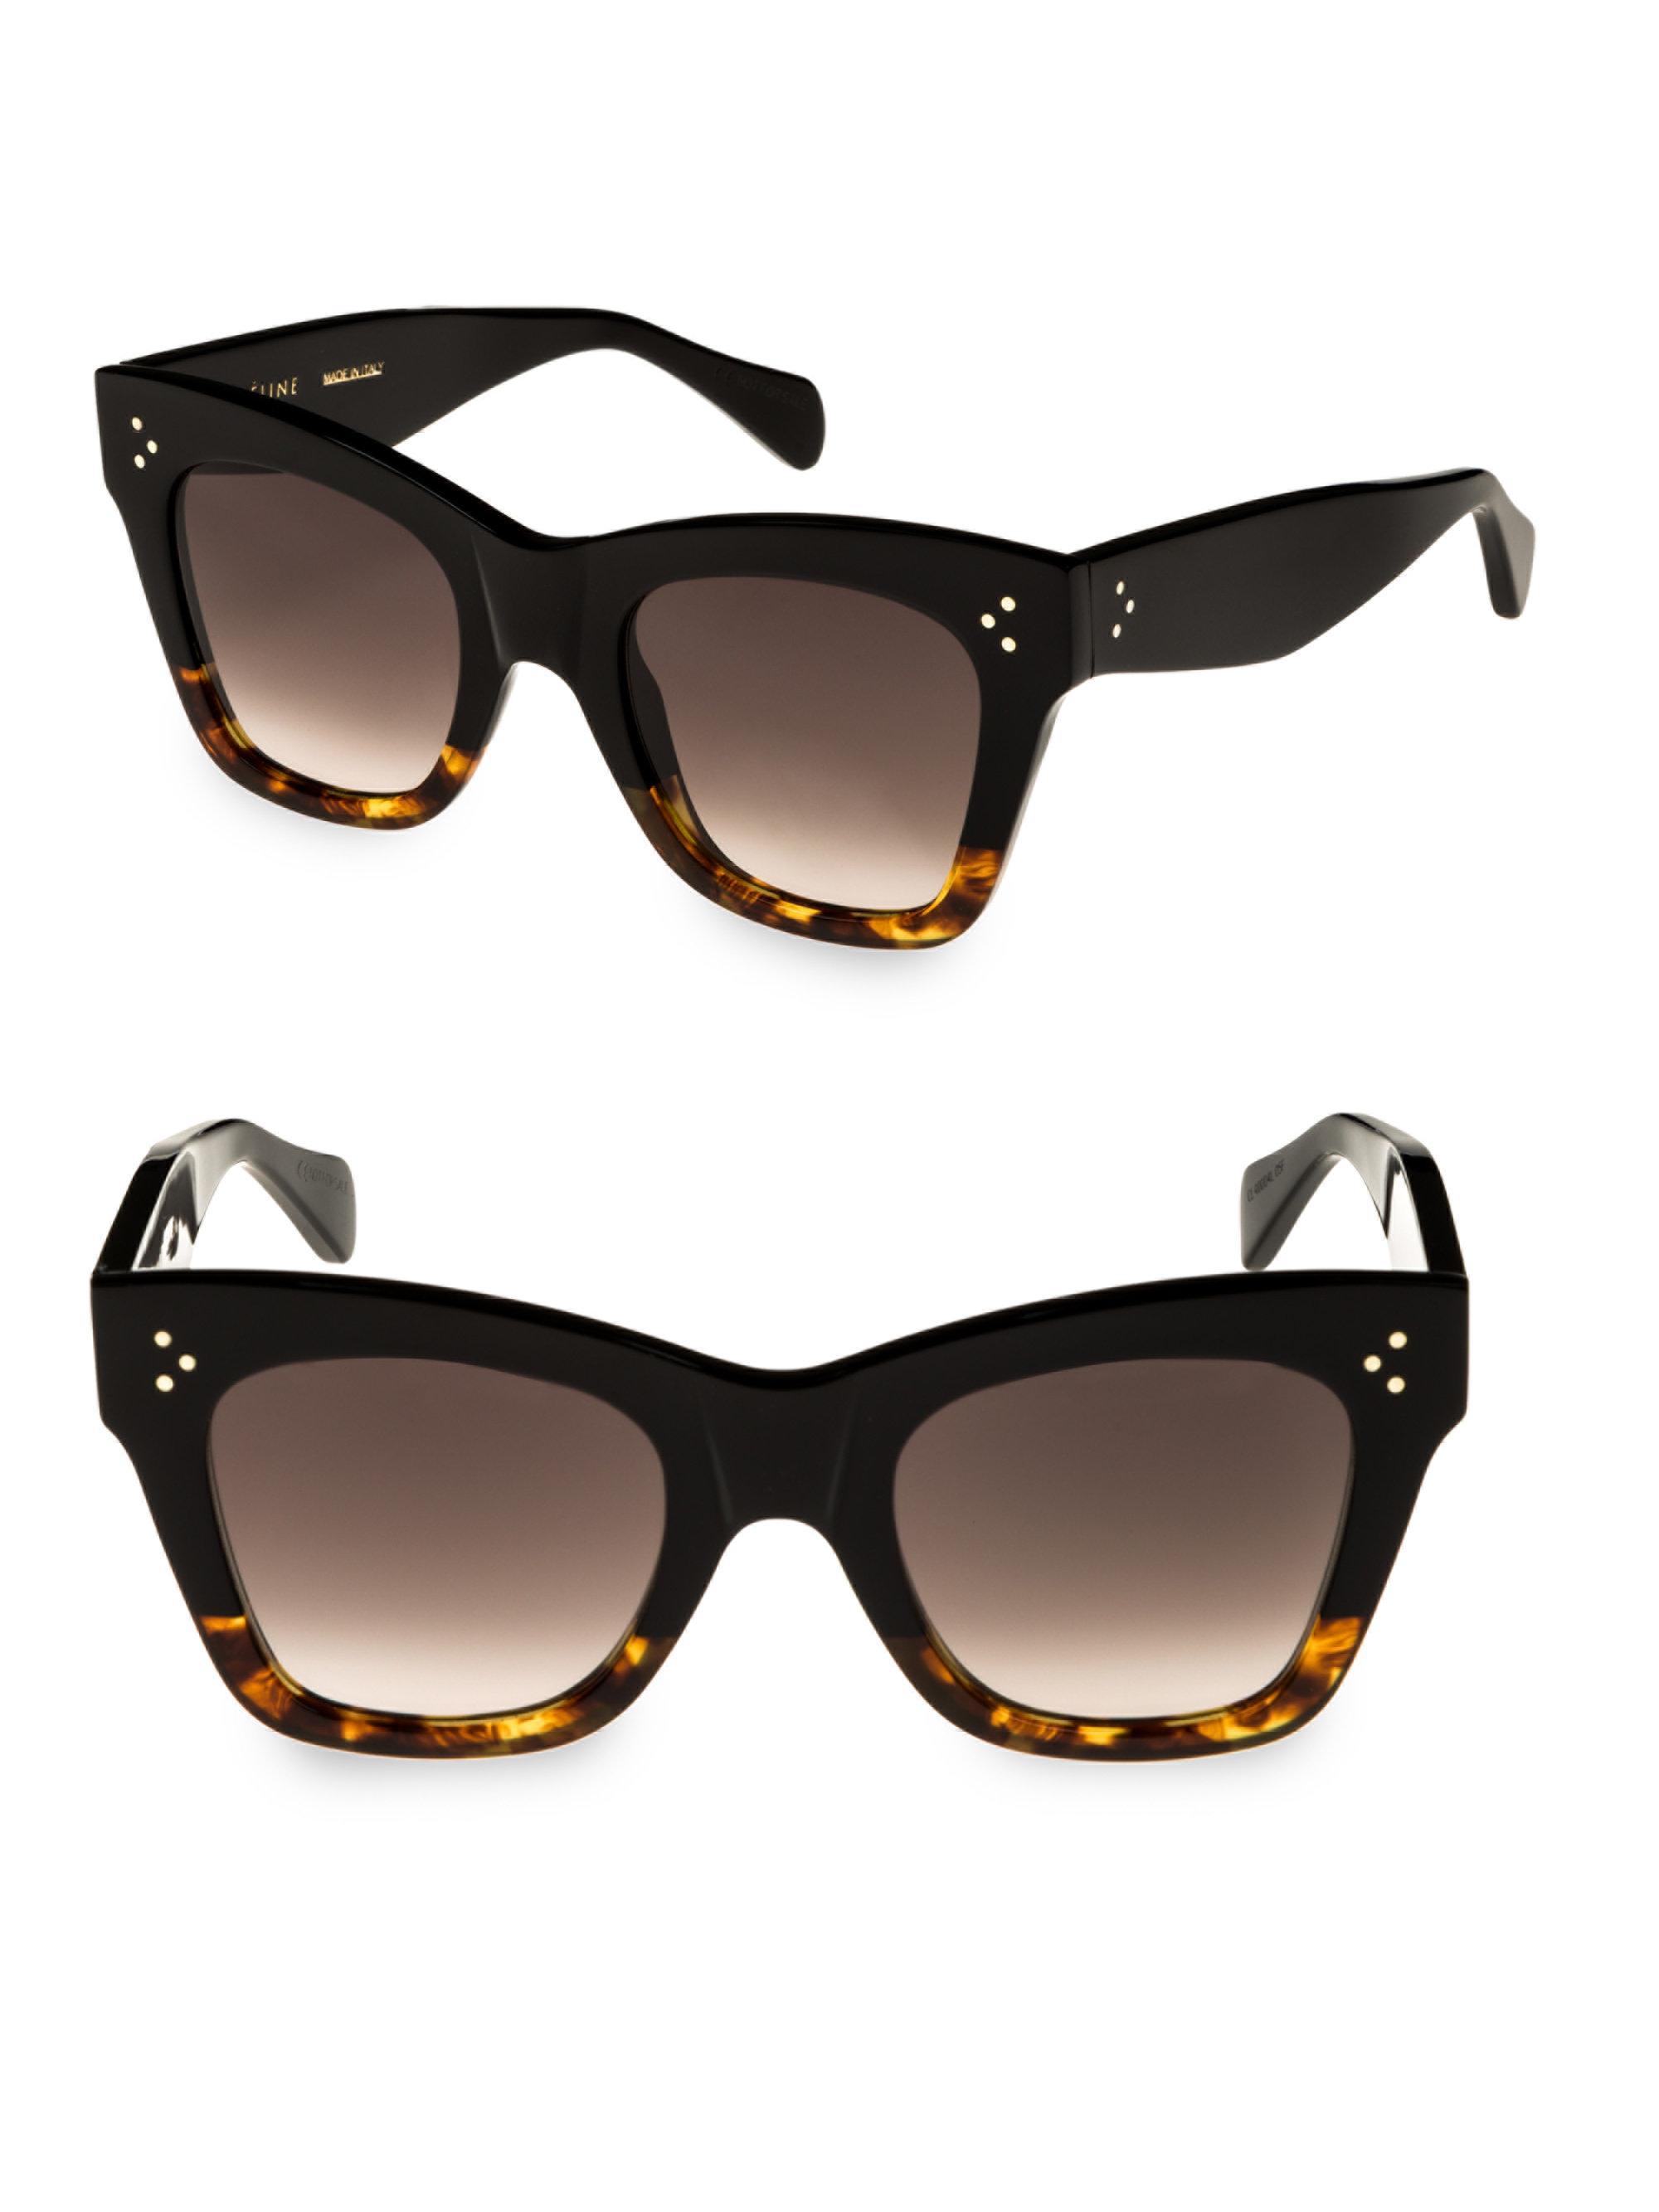 7858346f0e2 Céline Havana Rectangular Cat Eye Sunglasses in Brown - Lyst